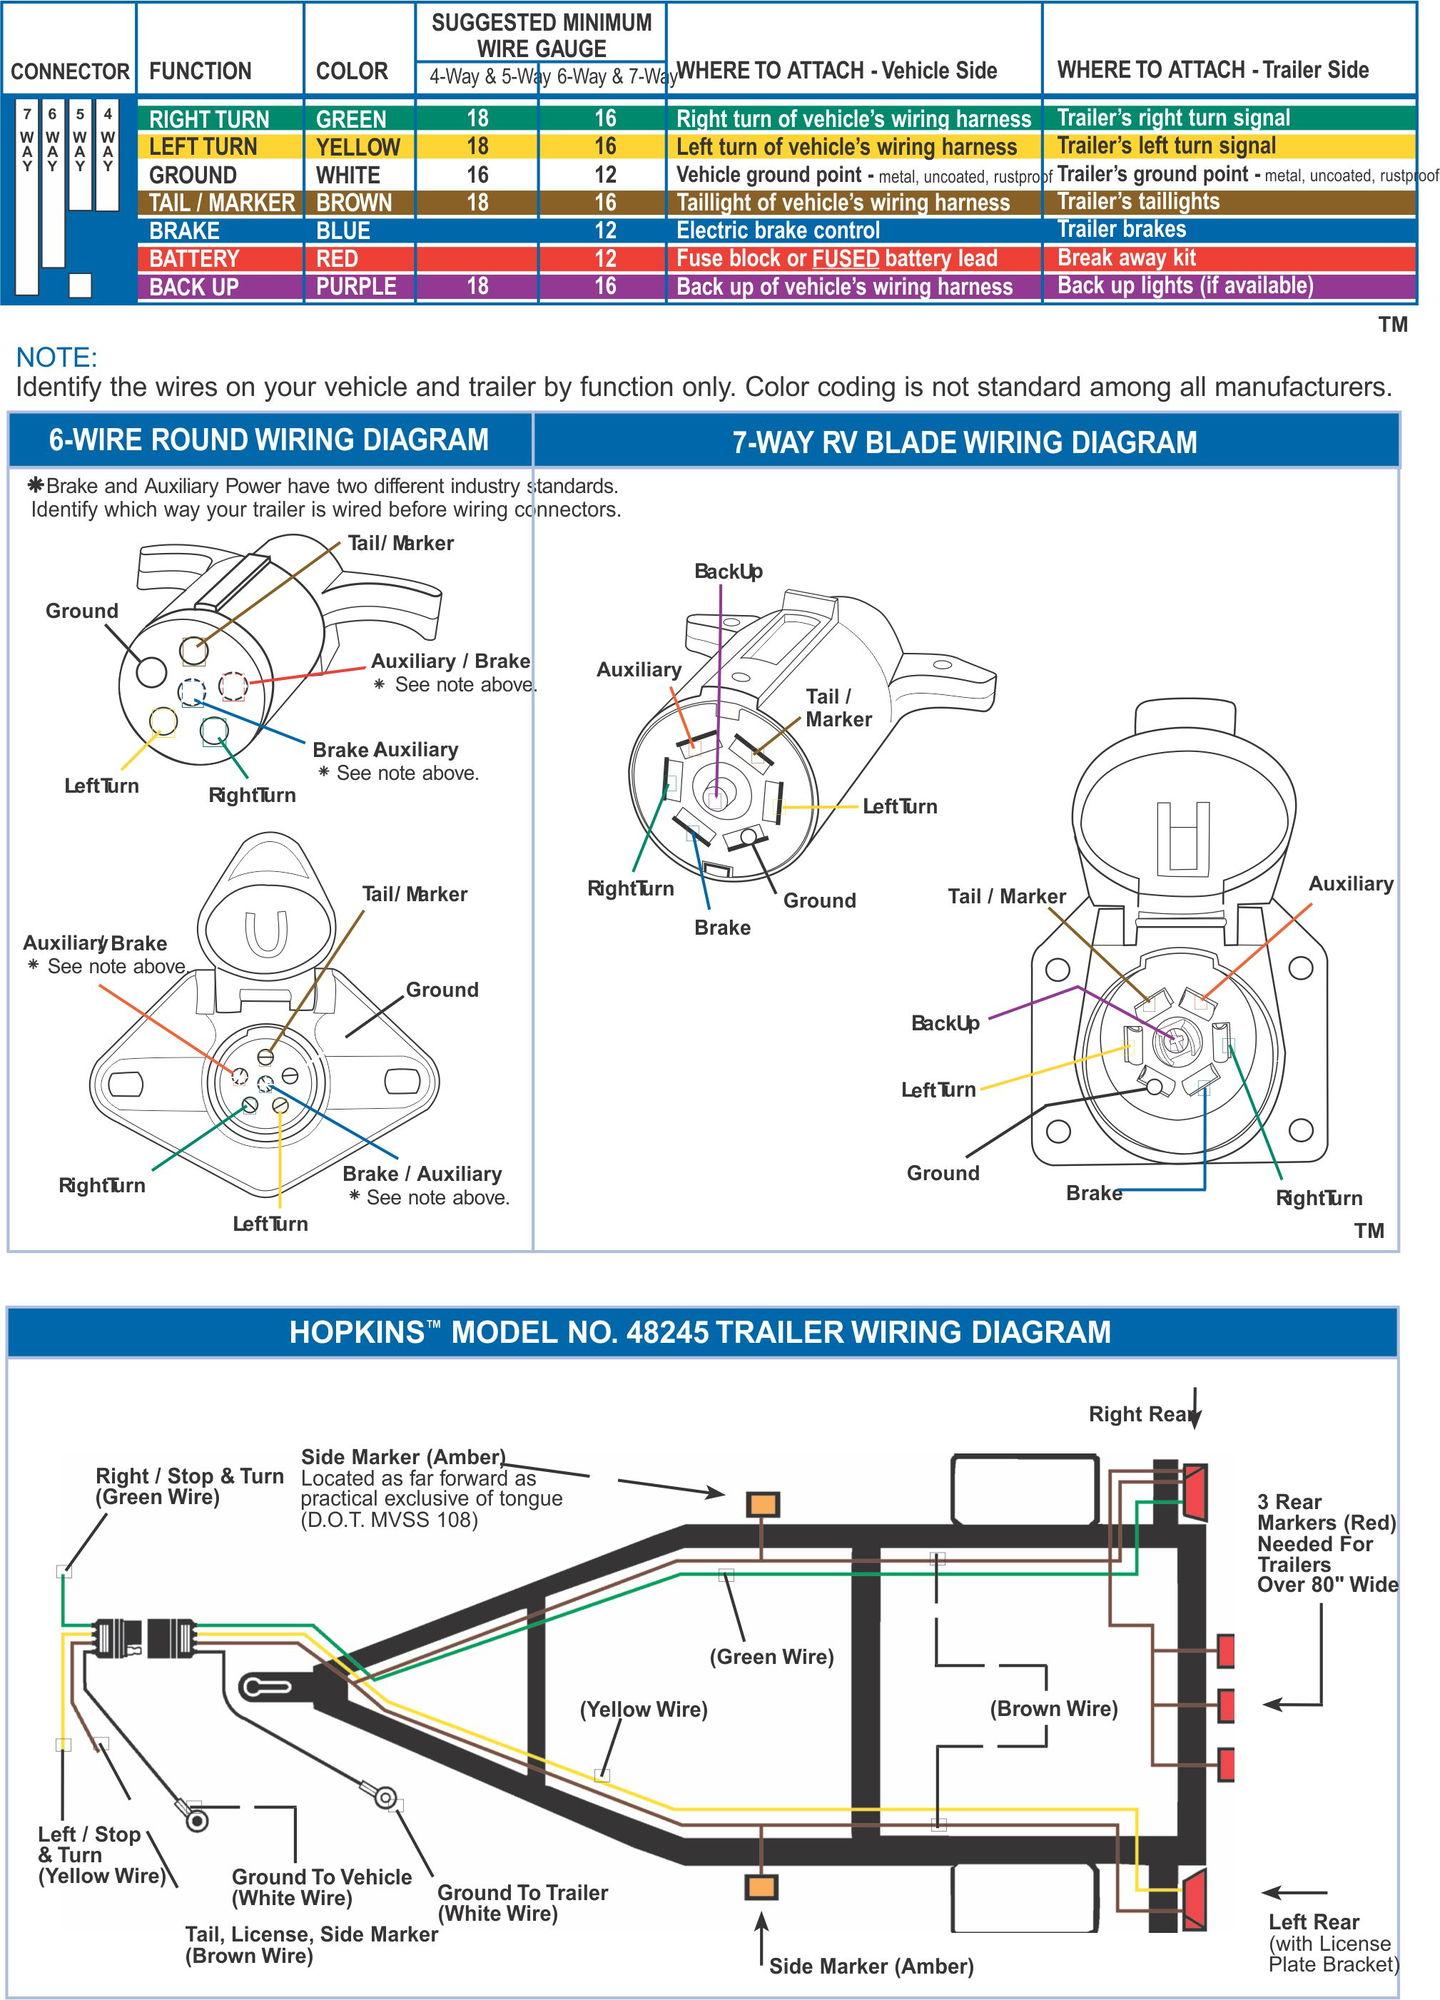 Llv Wiring Diagram 88 Auto Electrical Yanmar 1700 Ignition Grumman 26 Images